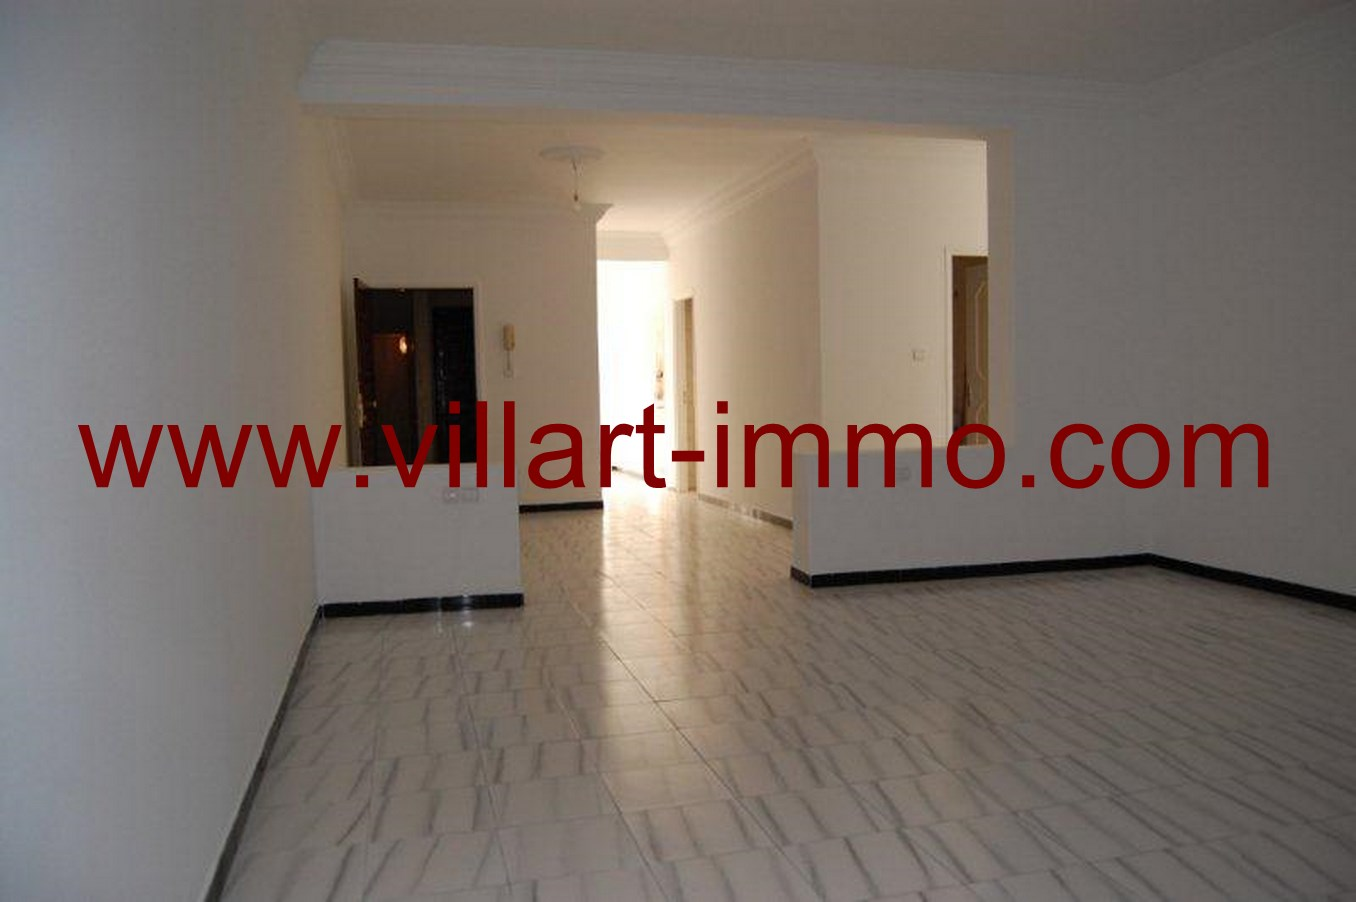 A louer appartement non meubl au centre ville de tanger villart - Appartement meuble a louer a tanger ...